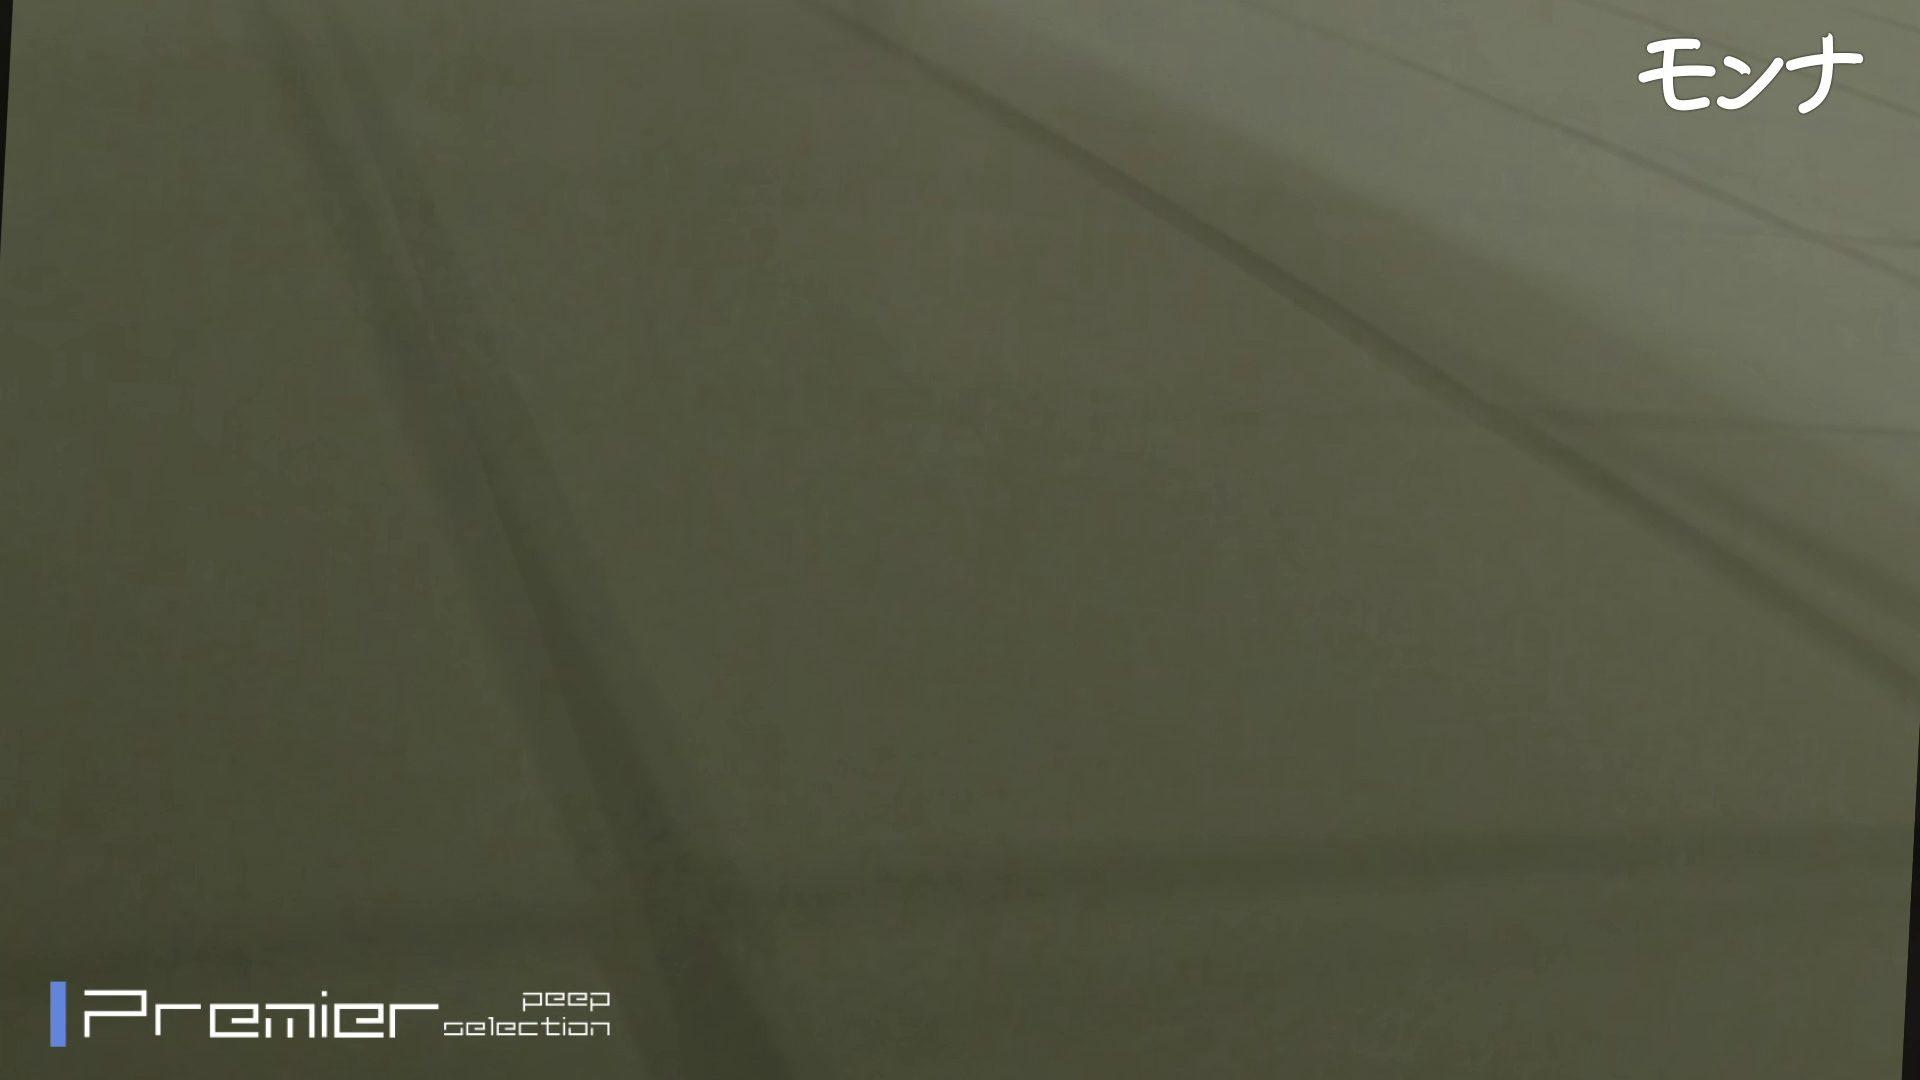 CM 悶絶シリーズ5 【美しい日本の未来 No.128】 洗面所のぞき オメコ動画キャプチャ 111枚 97